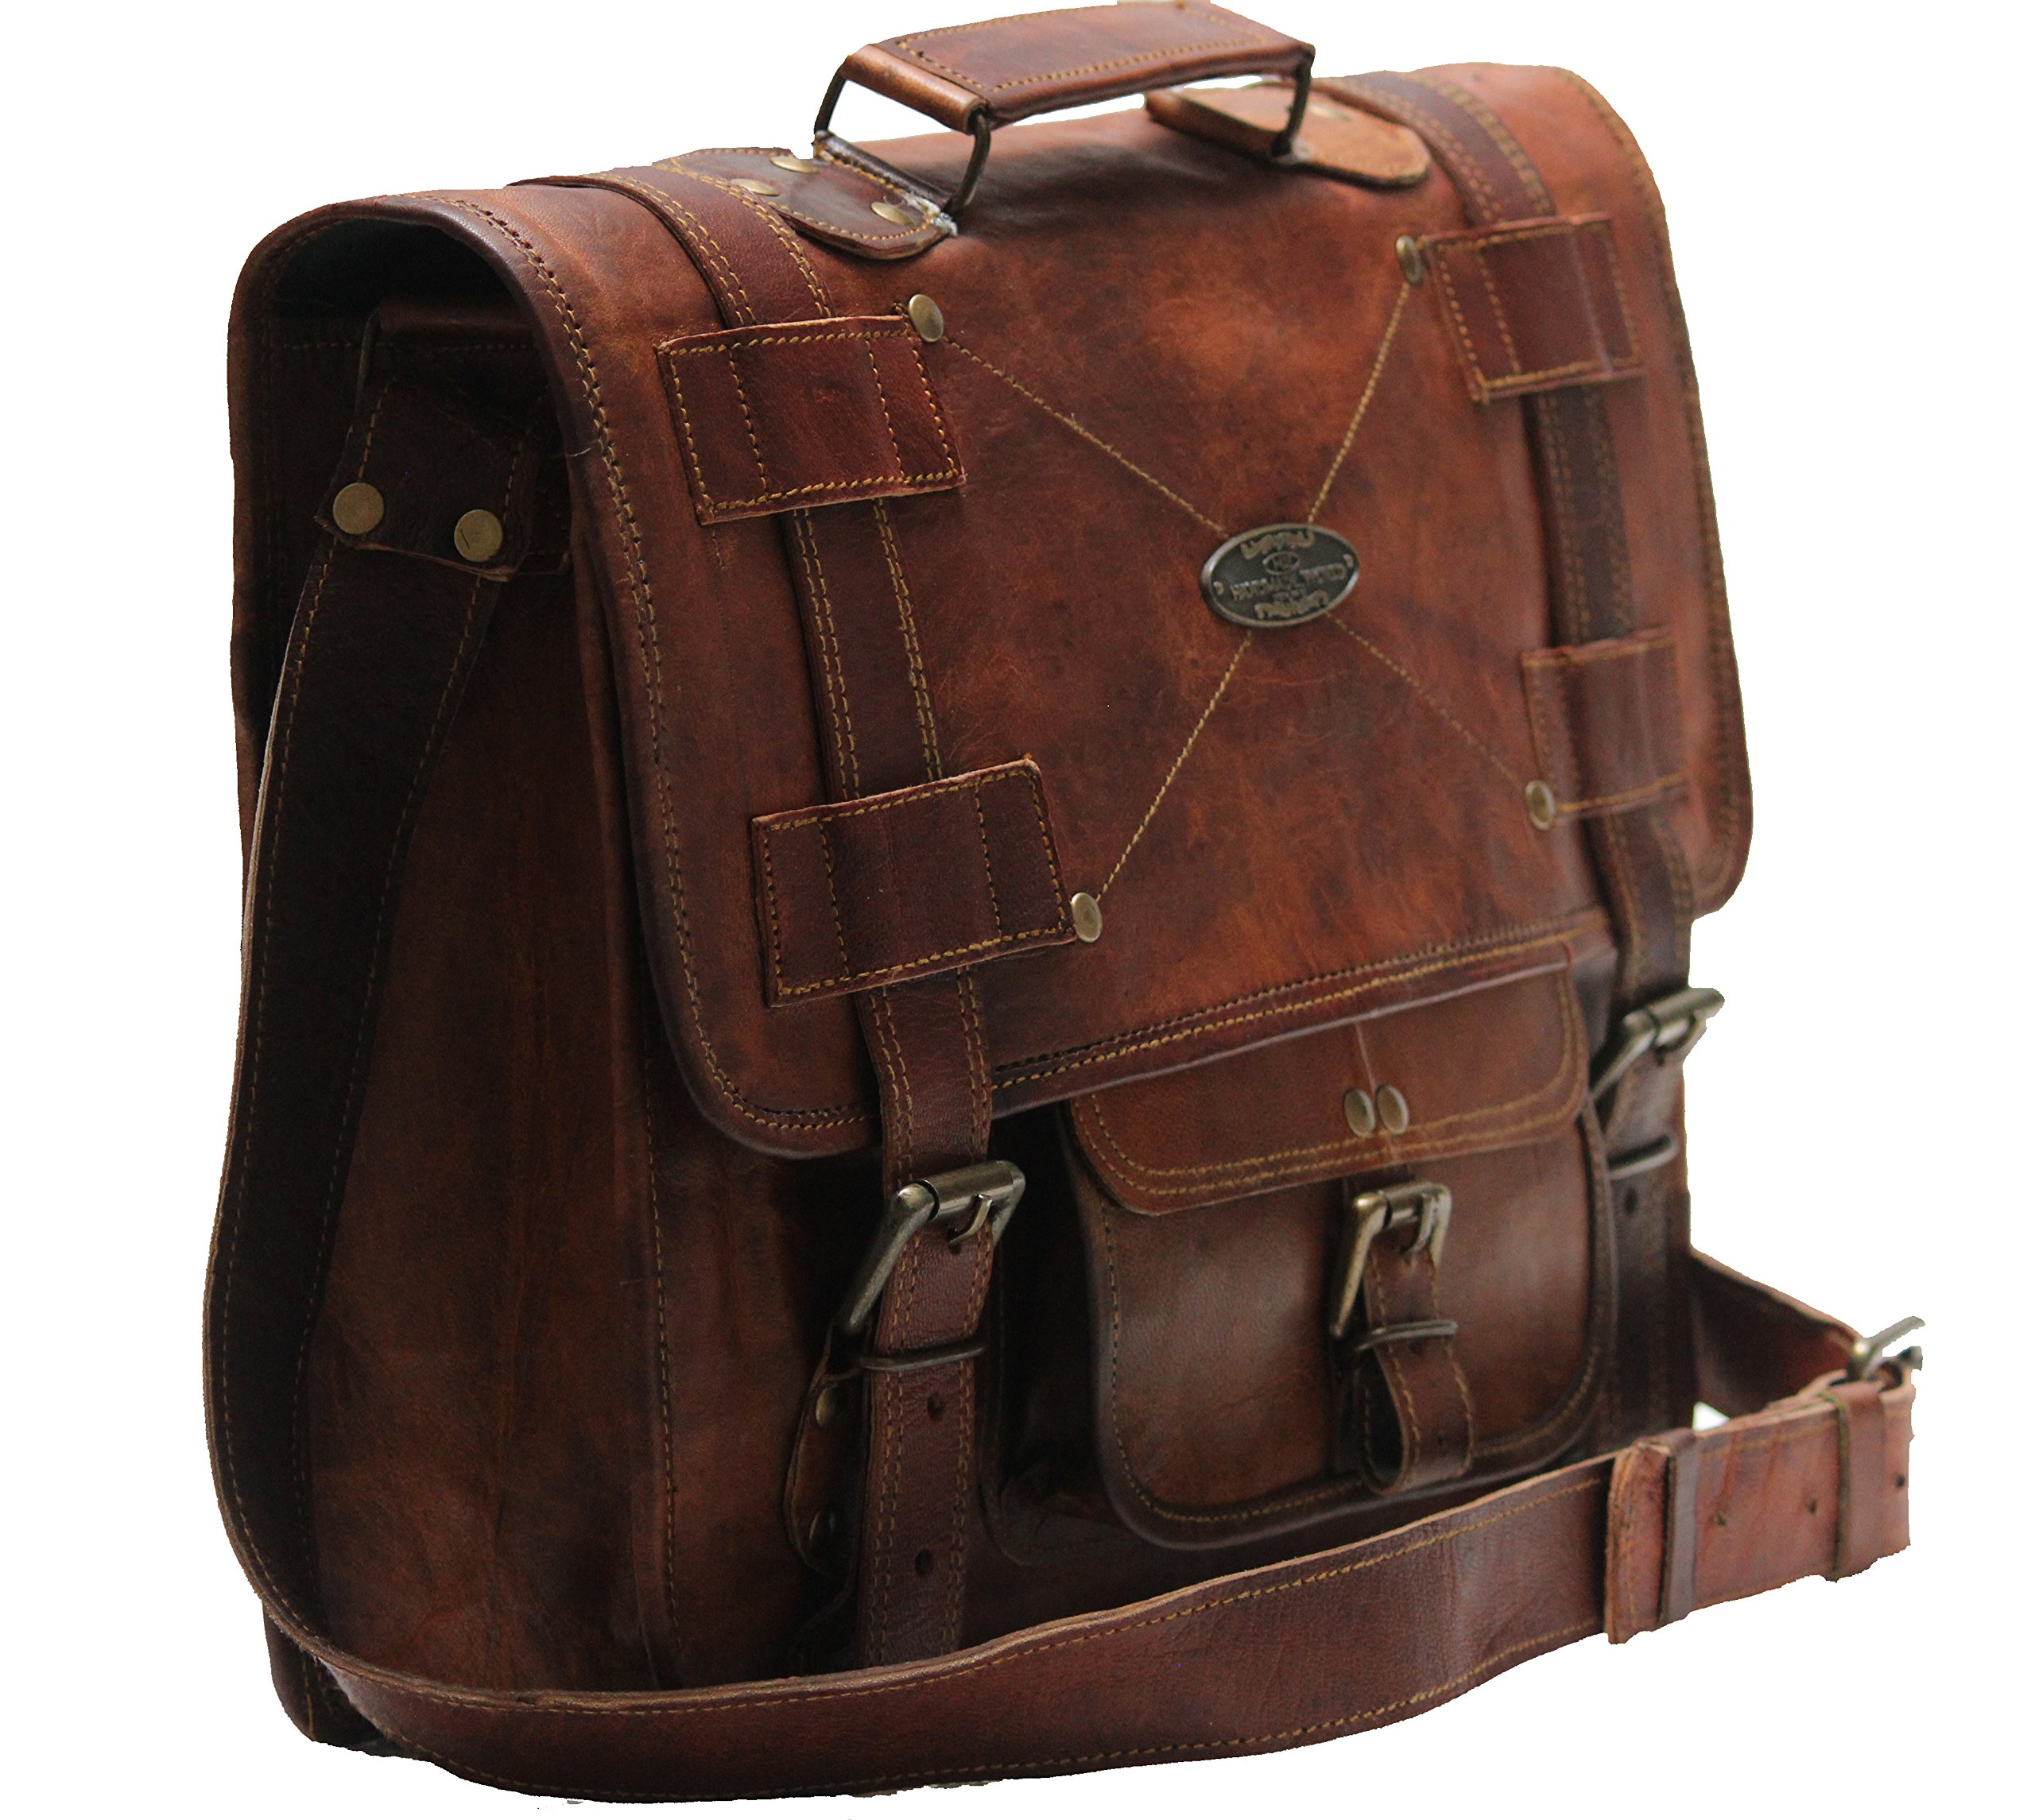 Leather Messenger Bags for Men Women Mens Briefcase Laptop Bag Best  Computer Shoulder Satchel School Distressed Bag 4435868abc779